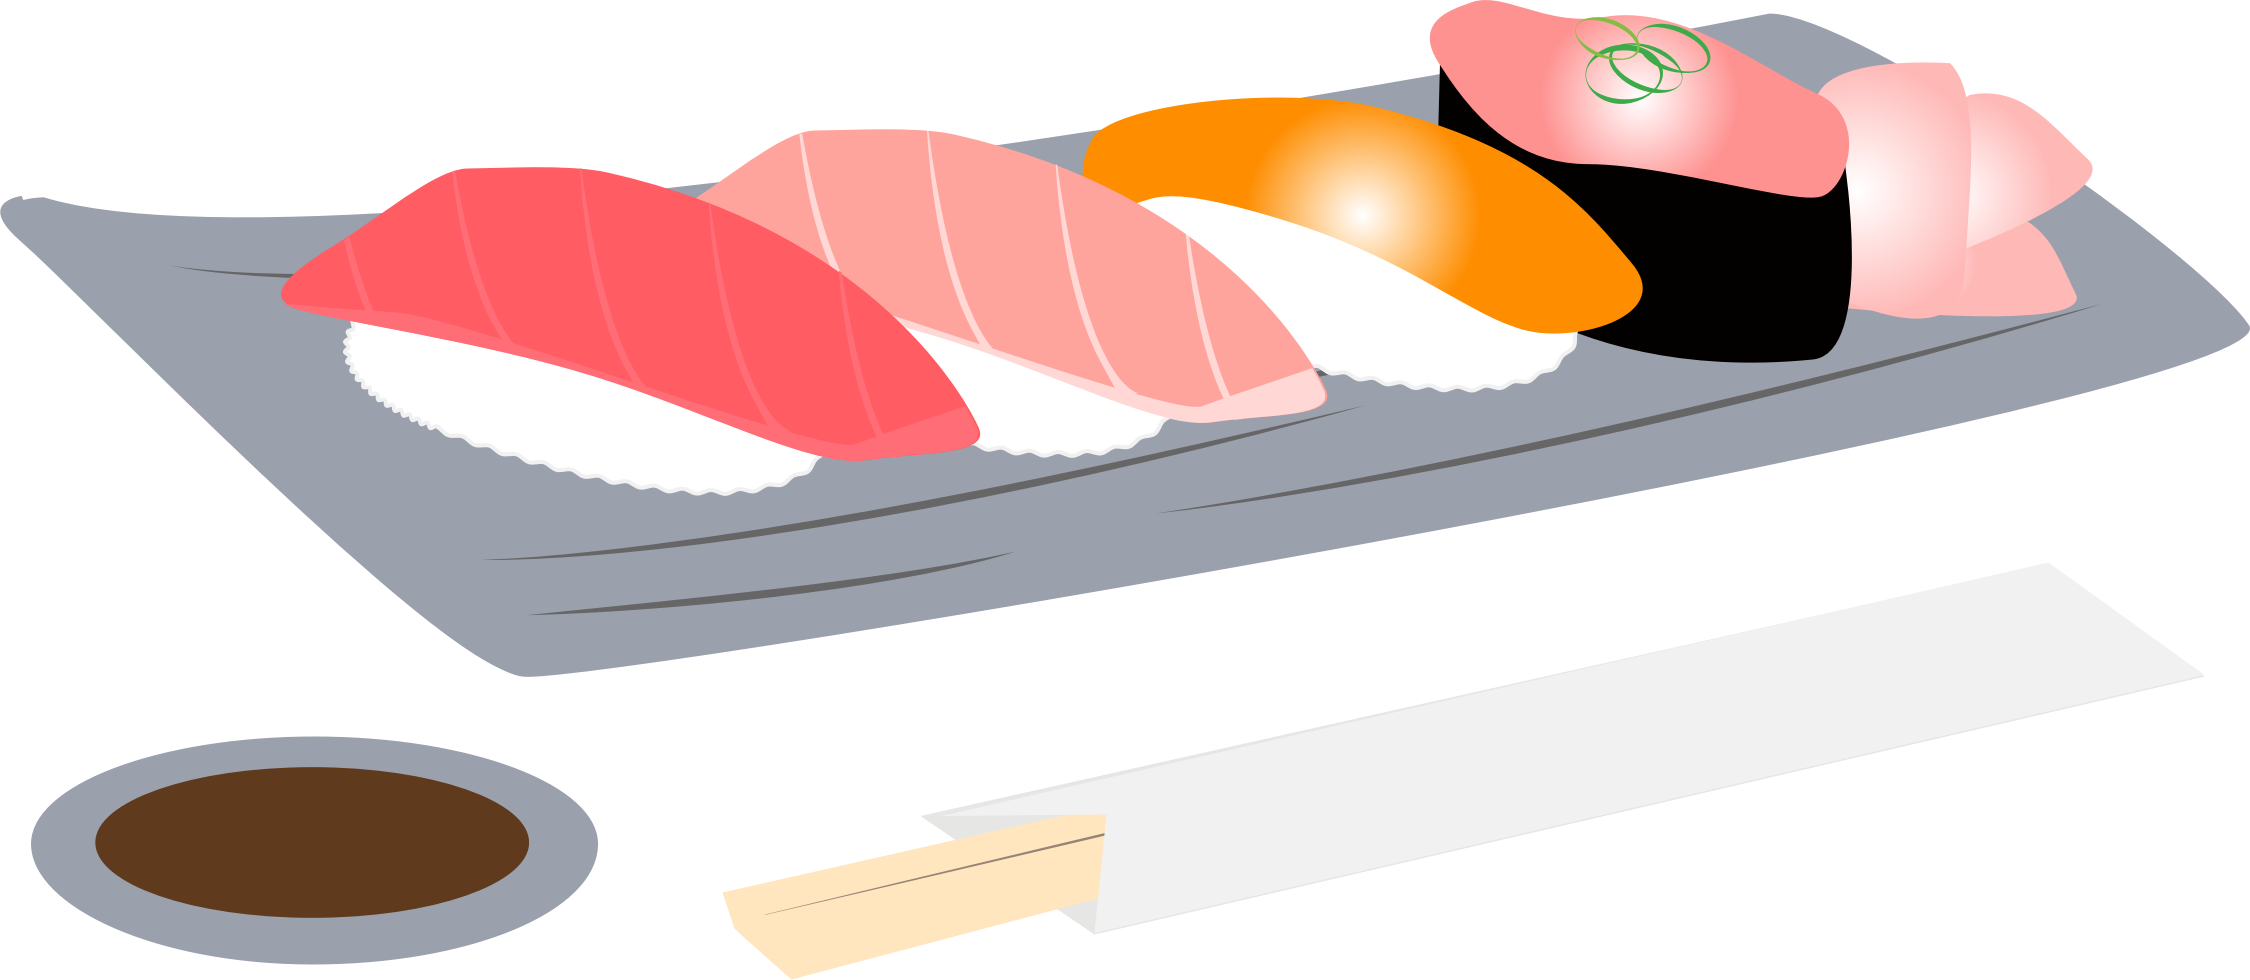 picture transparent download Sushi clipart. Assortment big image png